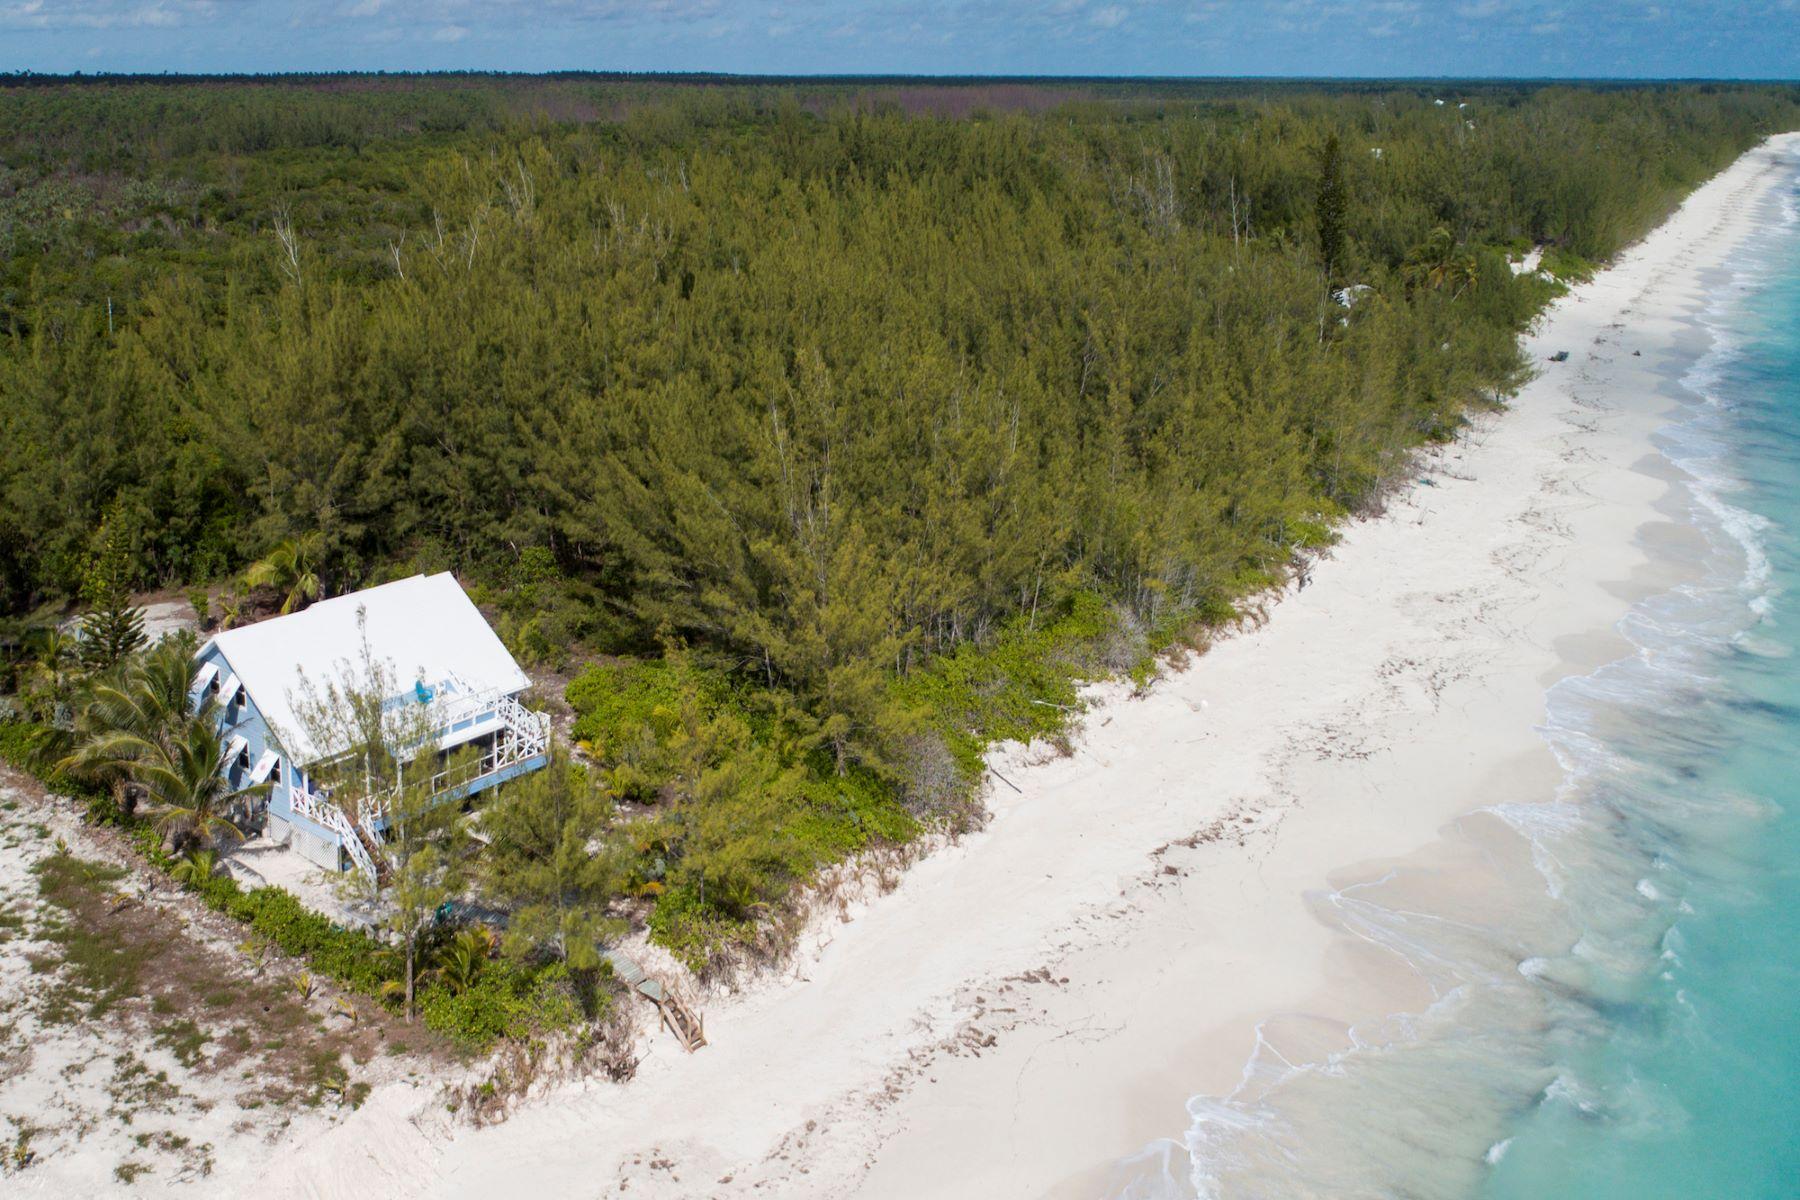 Single Family Homes for Sale at Bahama Palm Shores, Abaco Bahamas